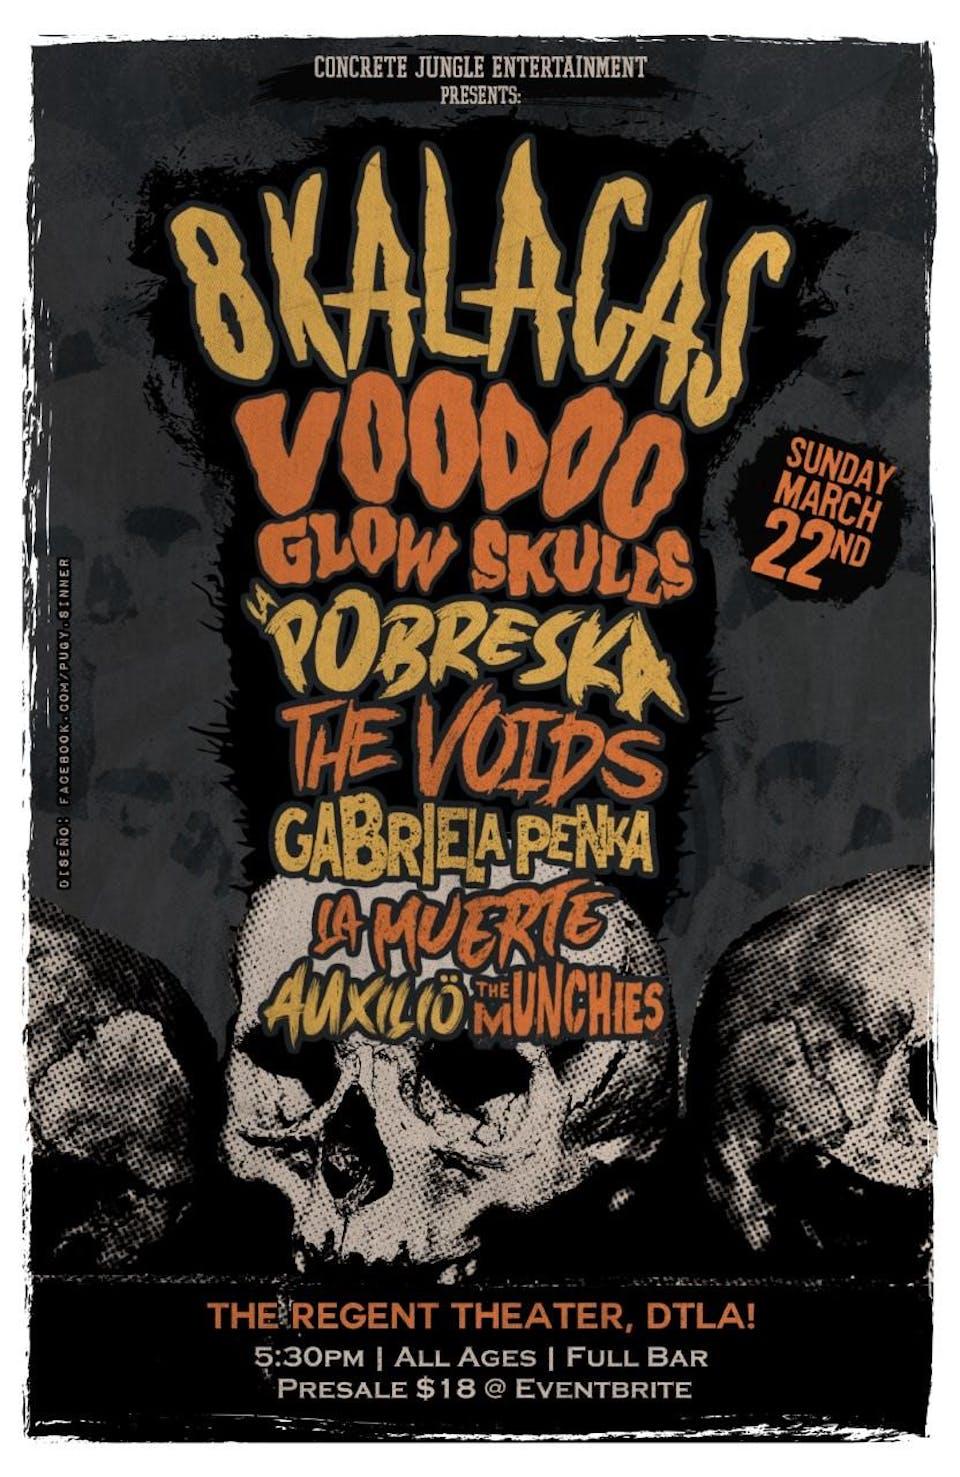 POSTPONED: 8 Kalacas / Voodoo Glow Skulls